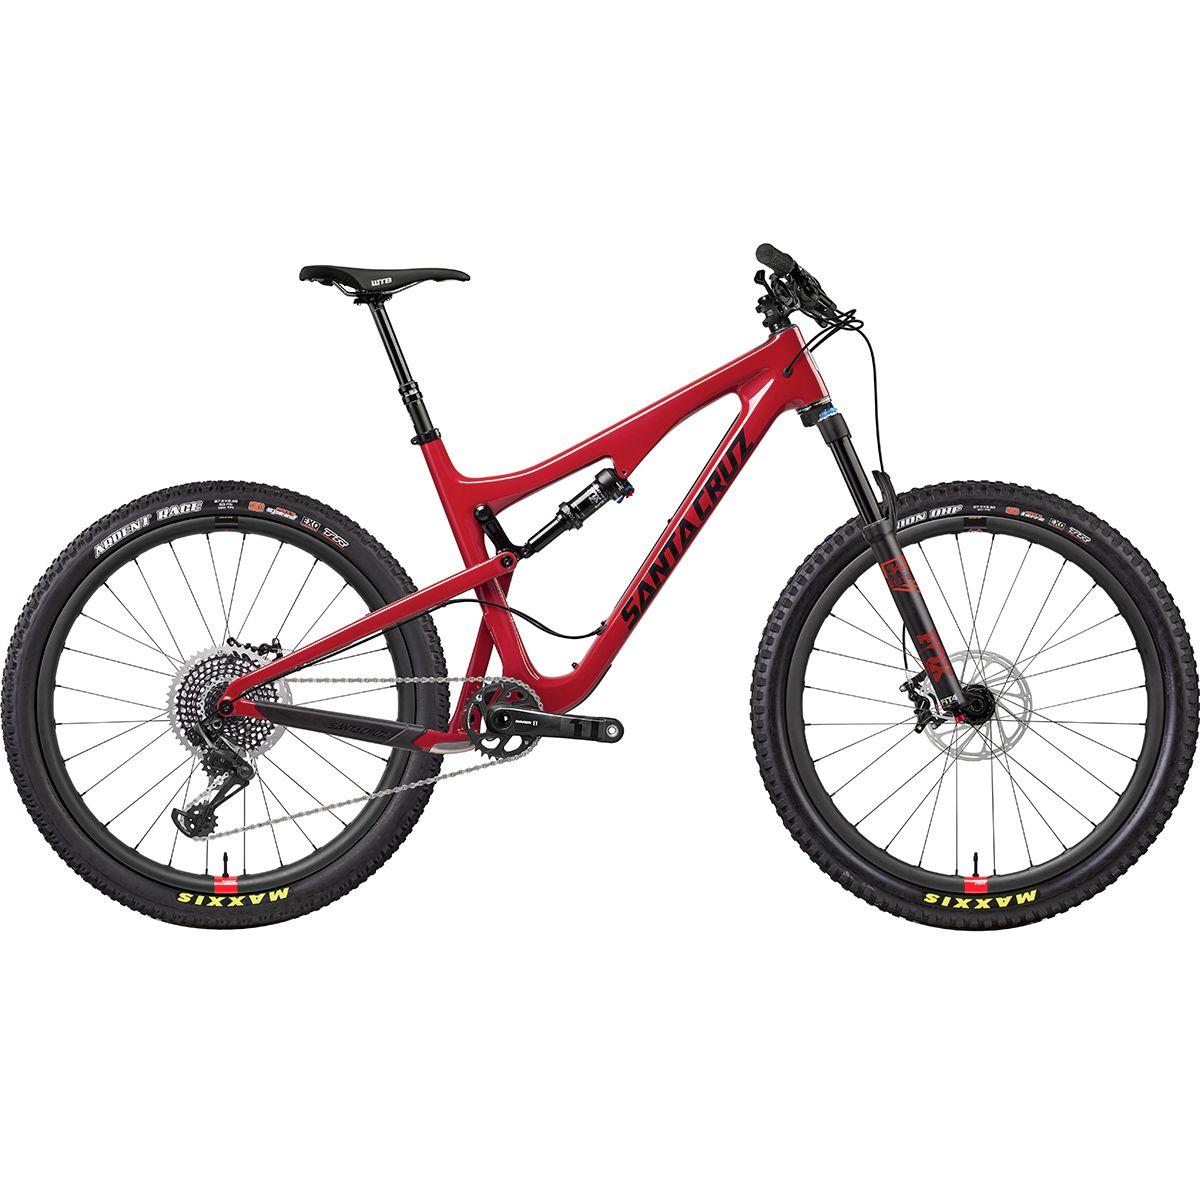 Santa Cruz Bicycles 5010 2.1 Carbon CC X01 Eagle Reserve Complete 2018